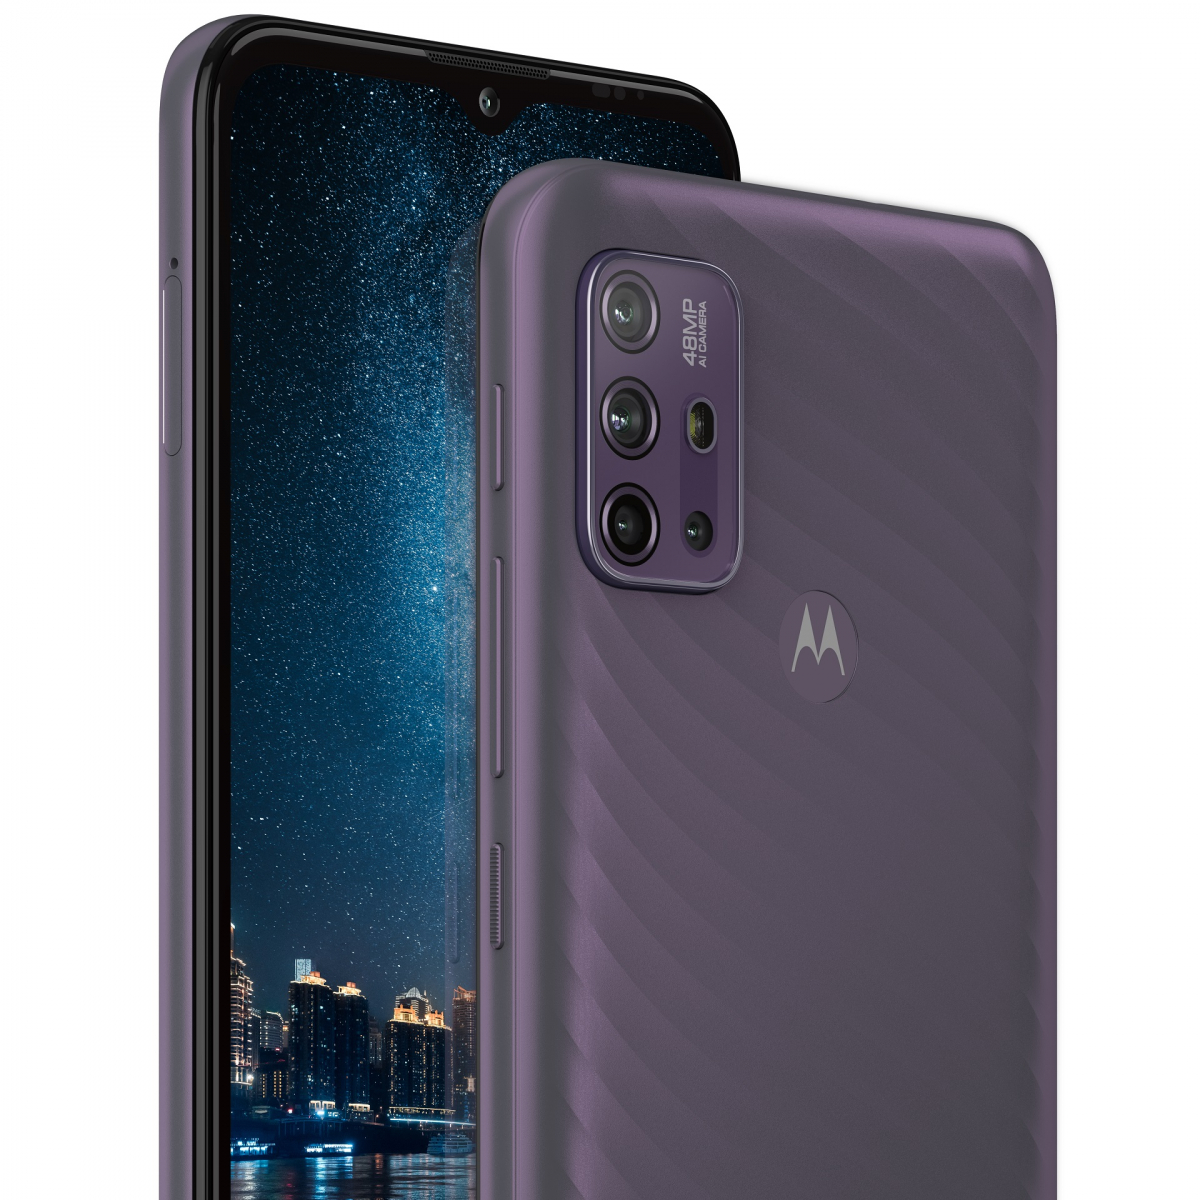 Telefoane ieftine și bune: Motorola moto g10 disponibil pe piața din România